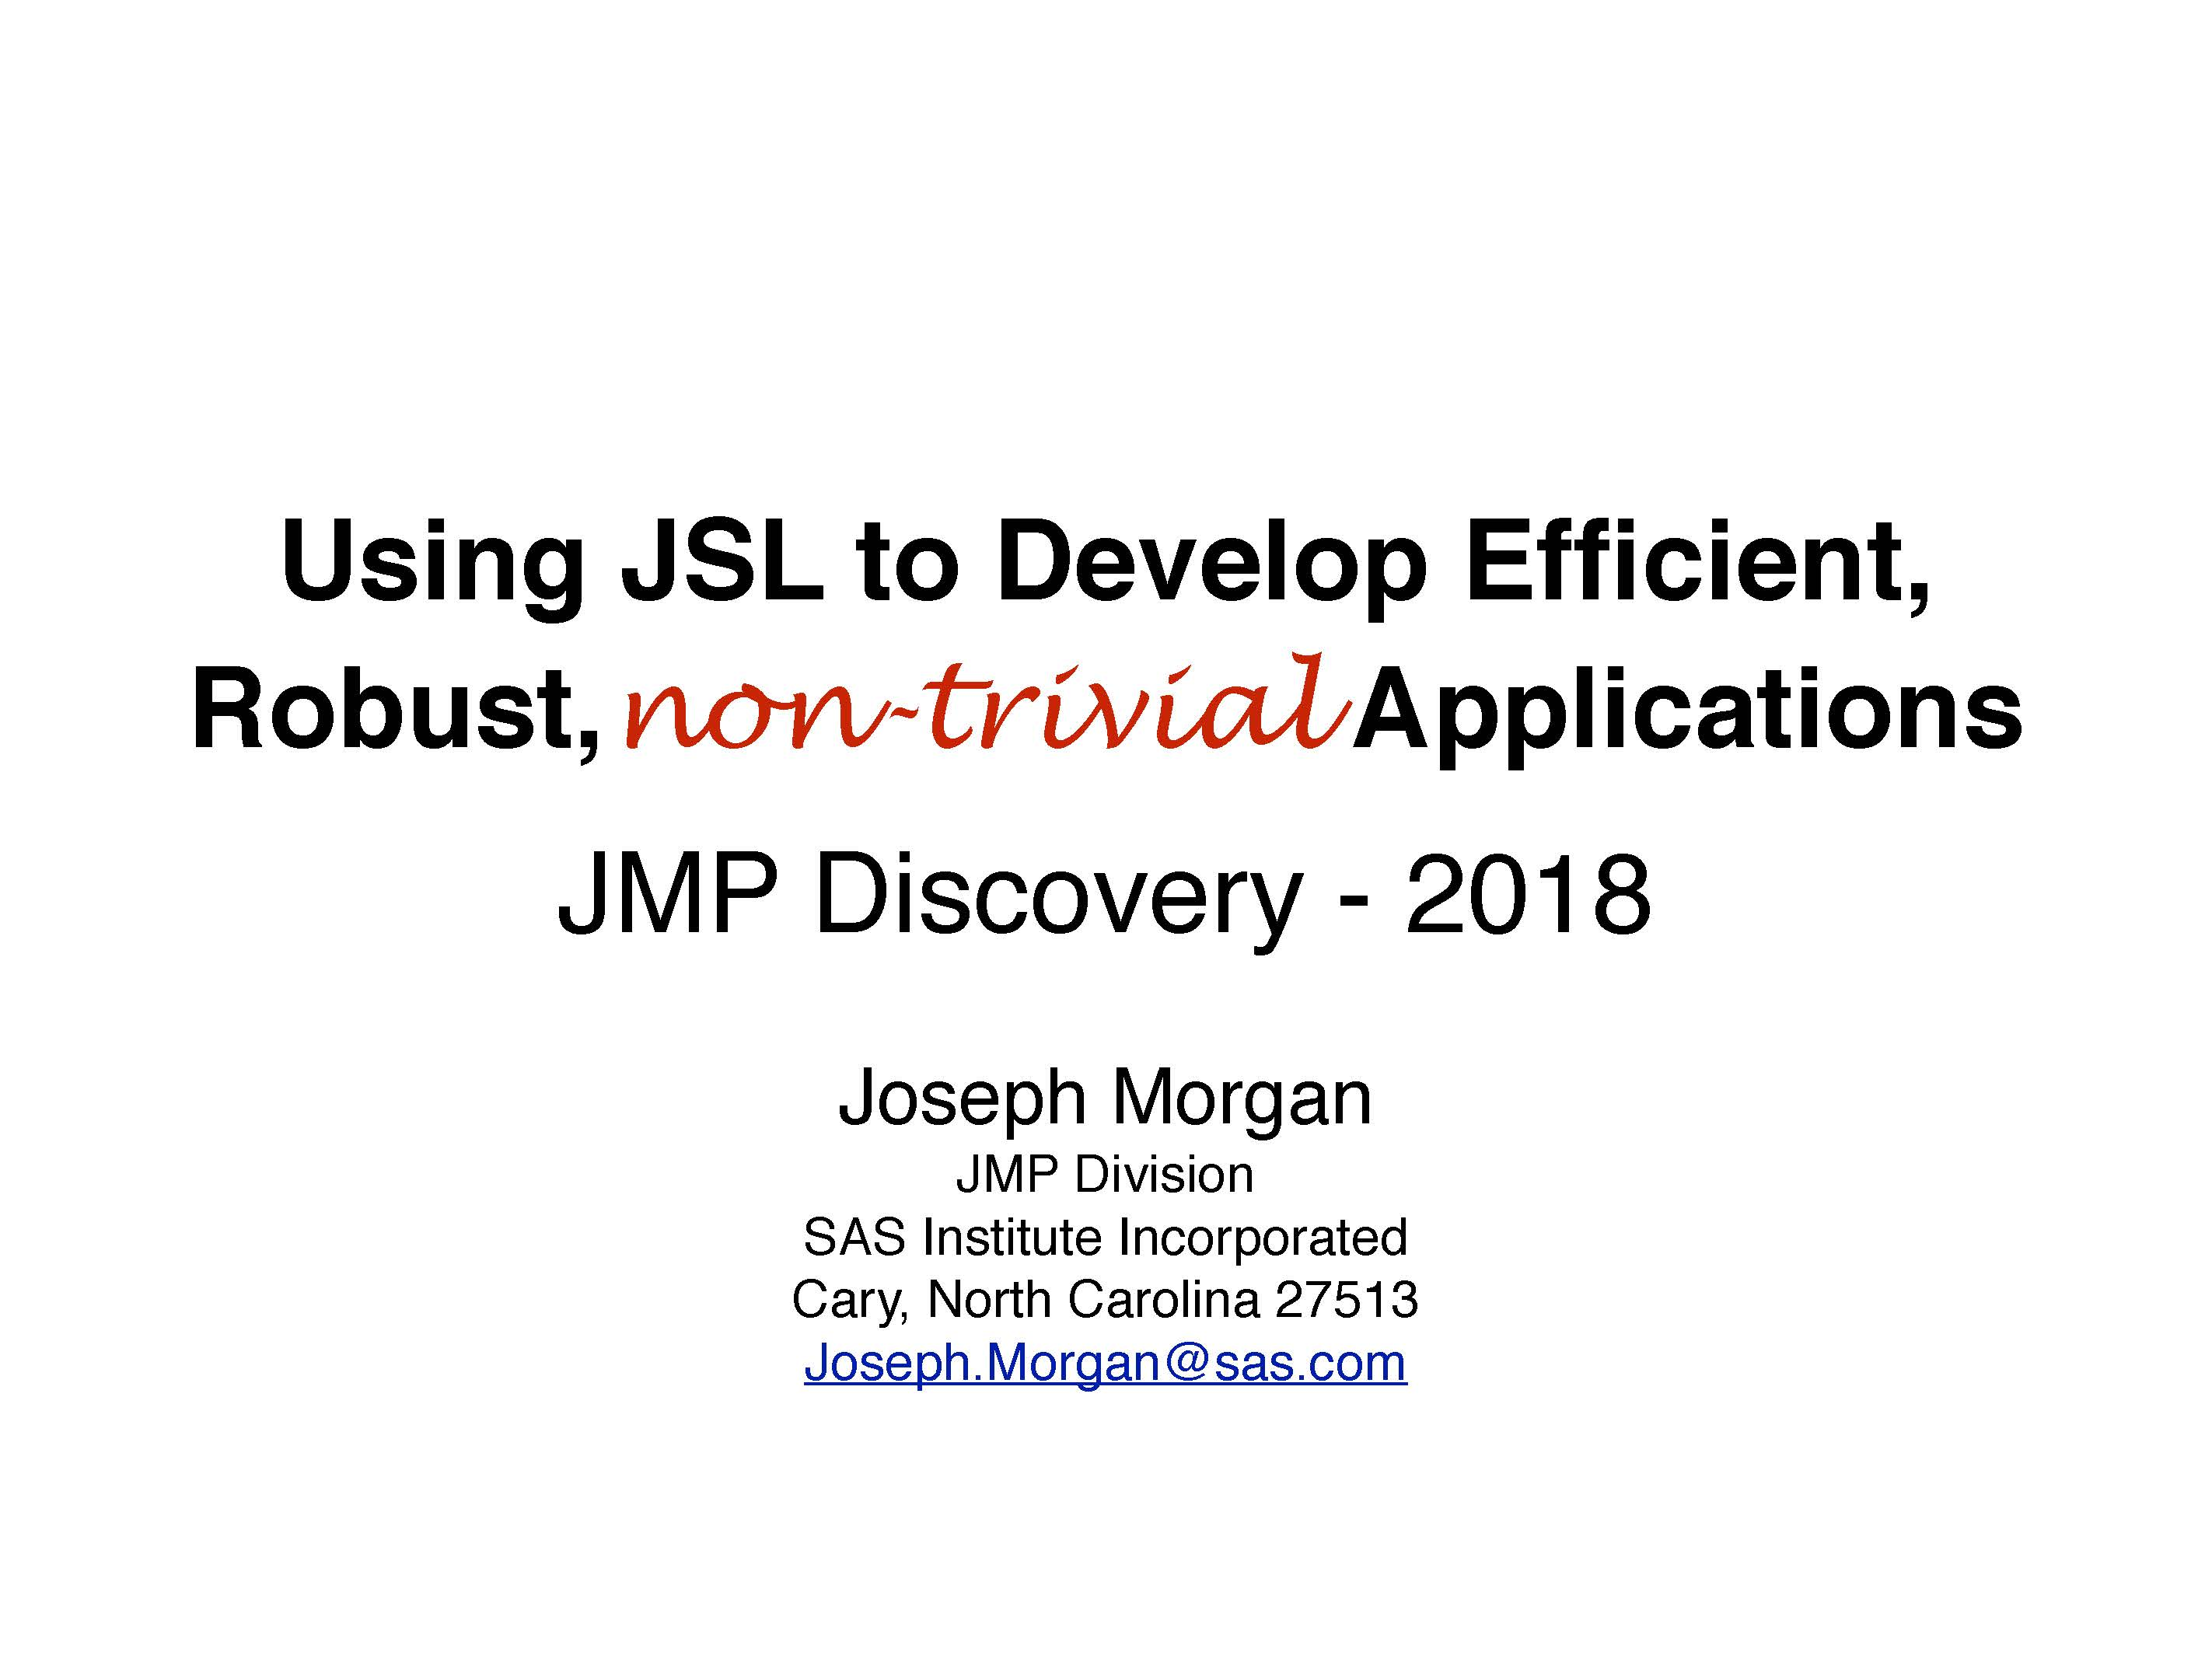 Tutorial - Using JSL to Develop Efficient, Robust, …